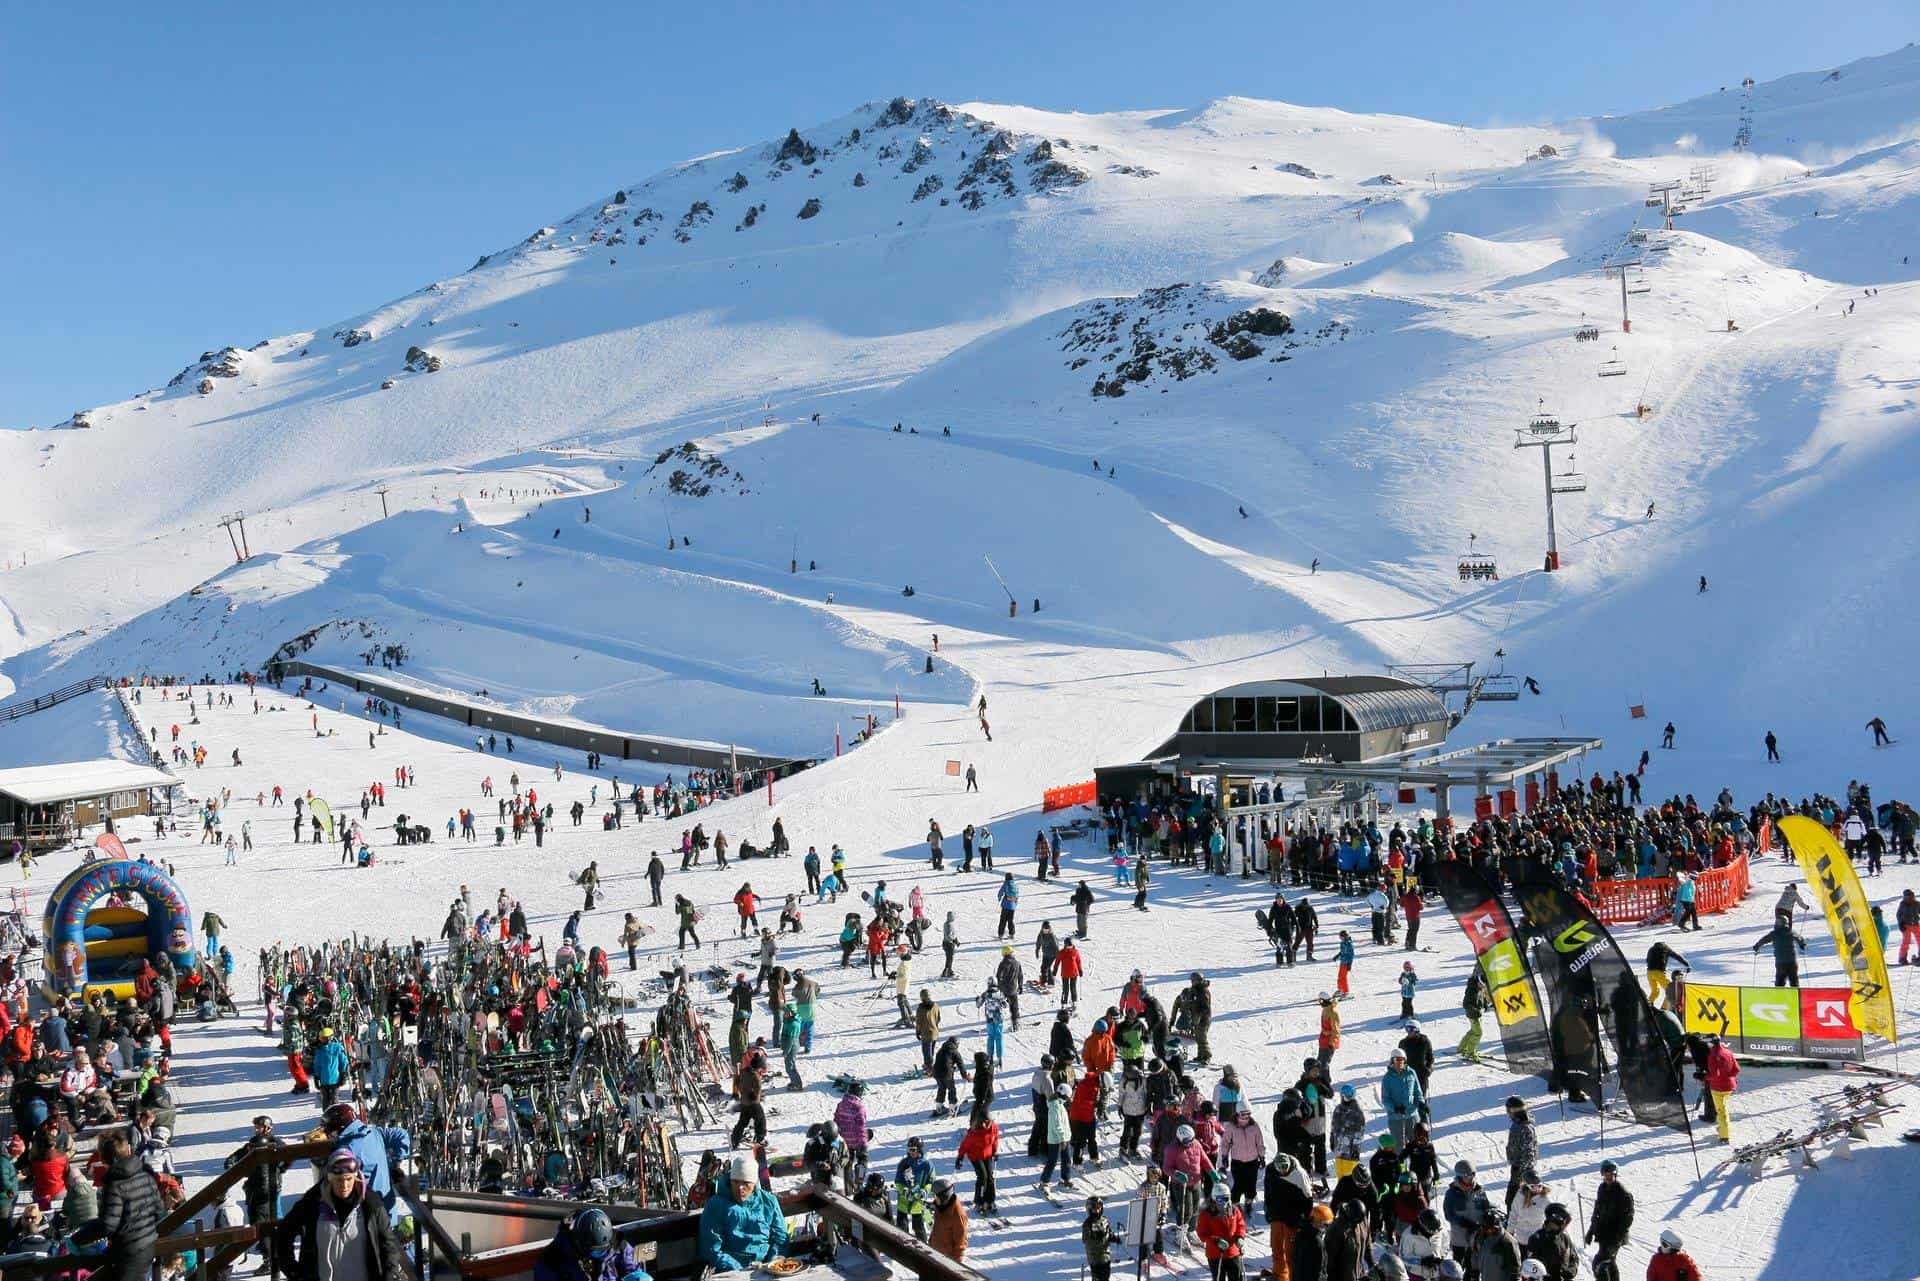 The Grasshopper's 2019 New Zealand Snow Season Outlook